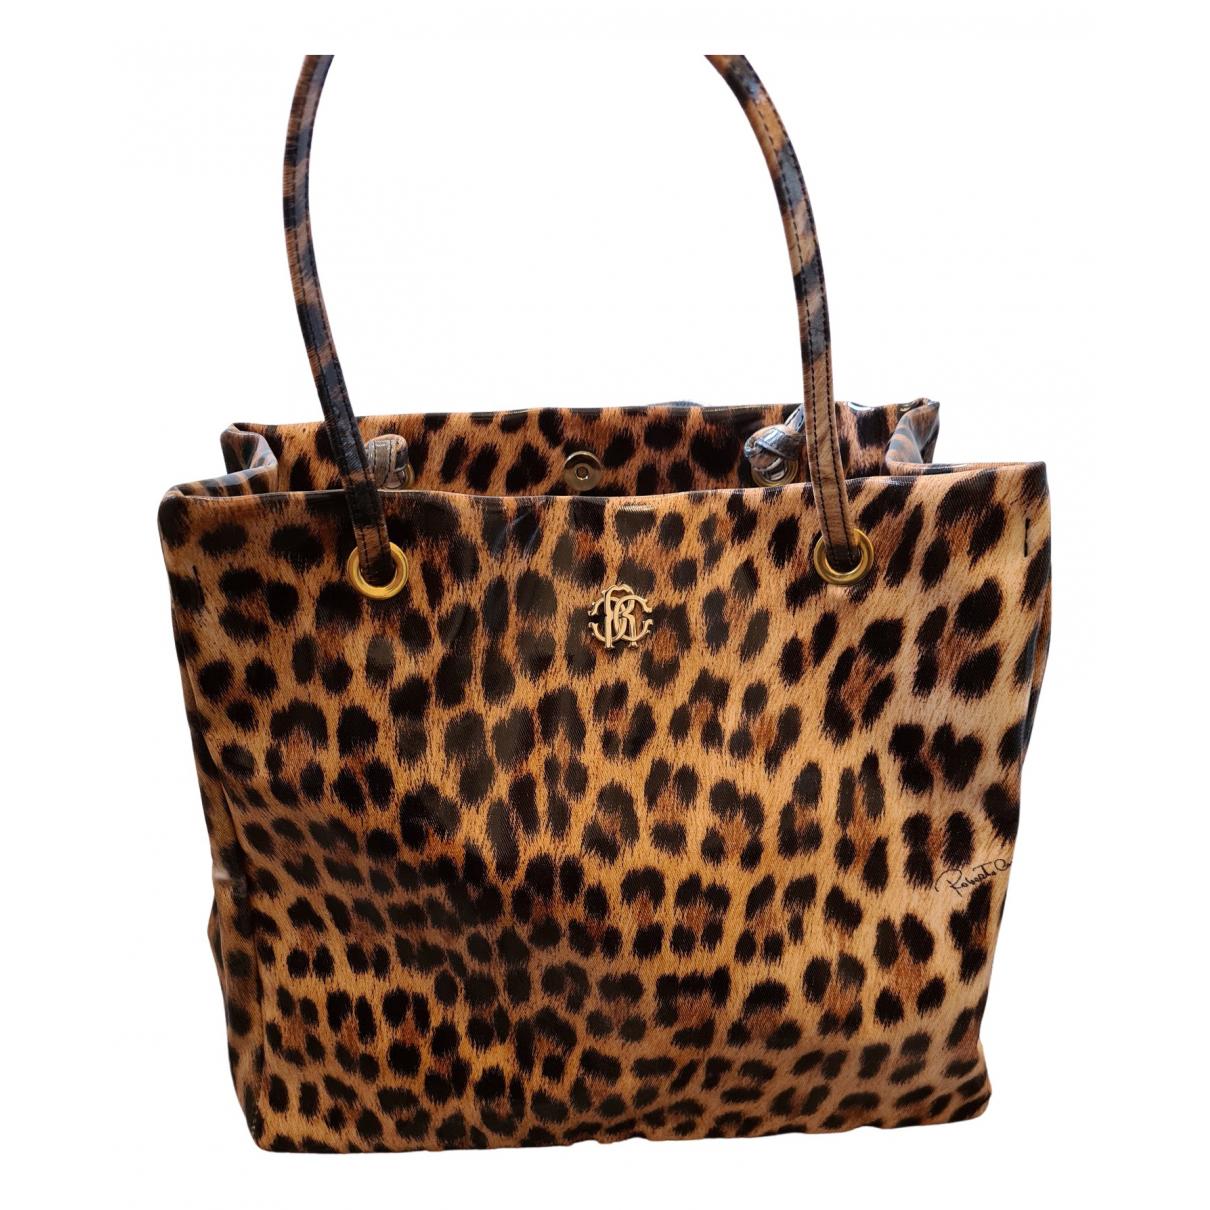 Roberto Cavalli N handbag for Women N